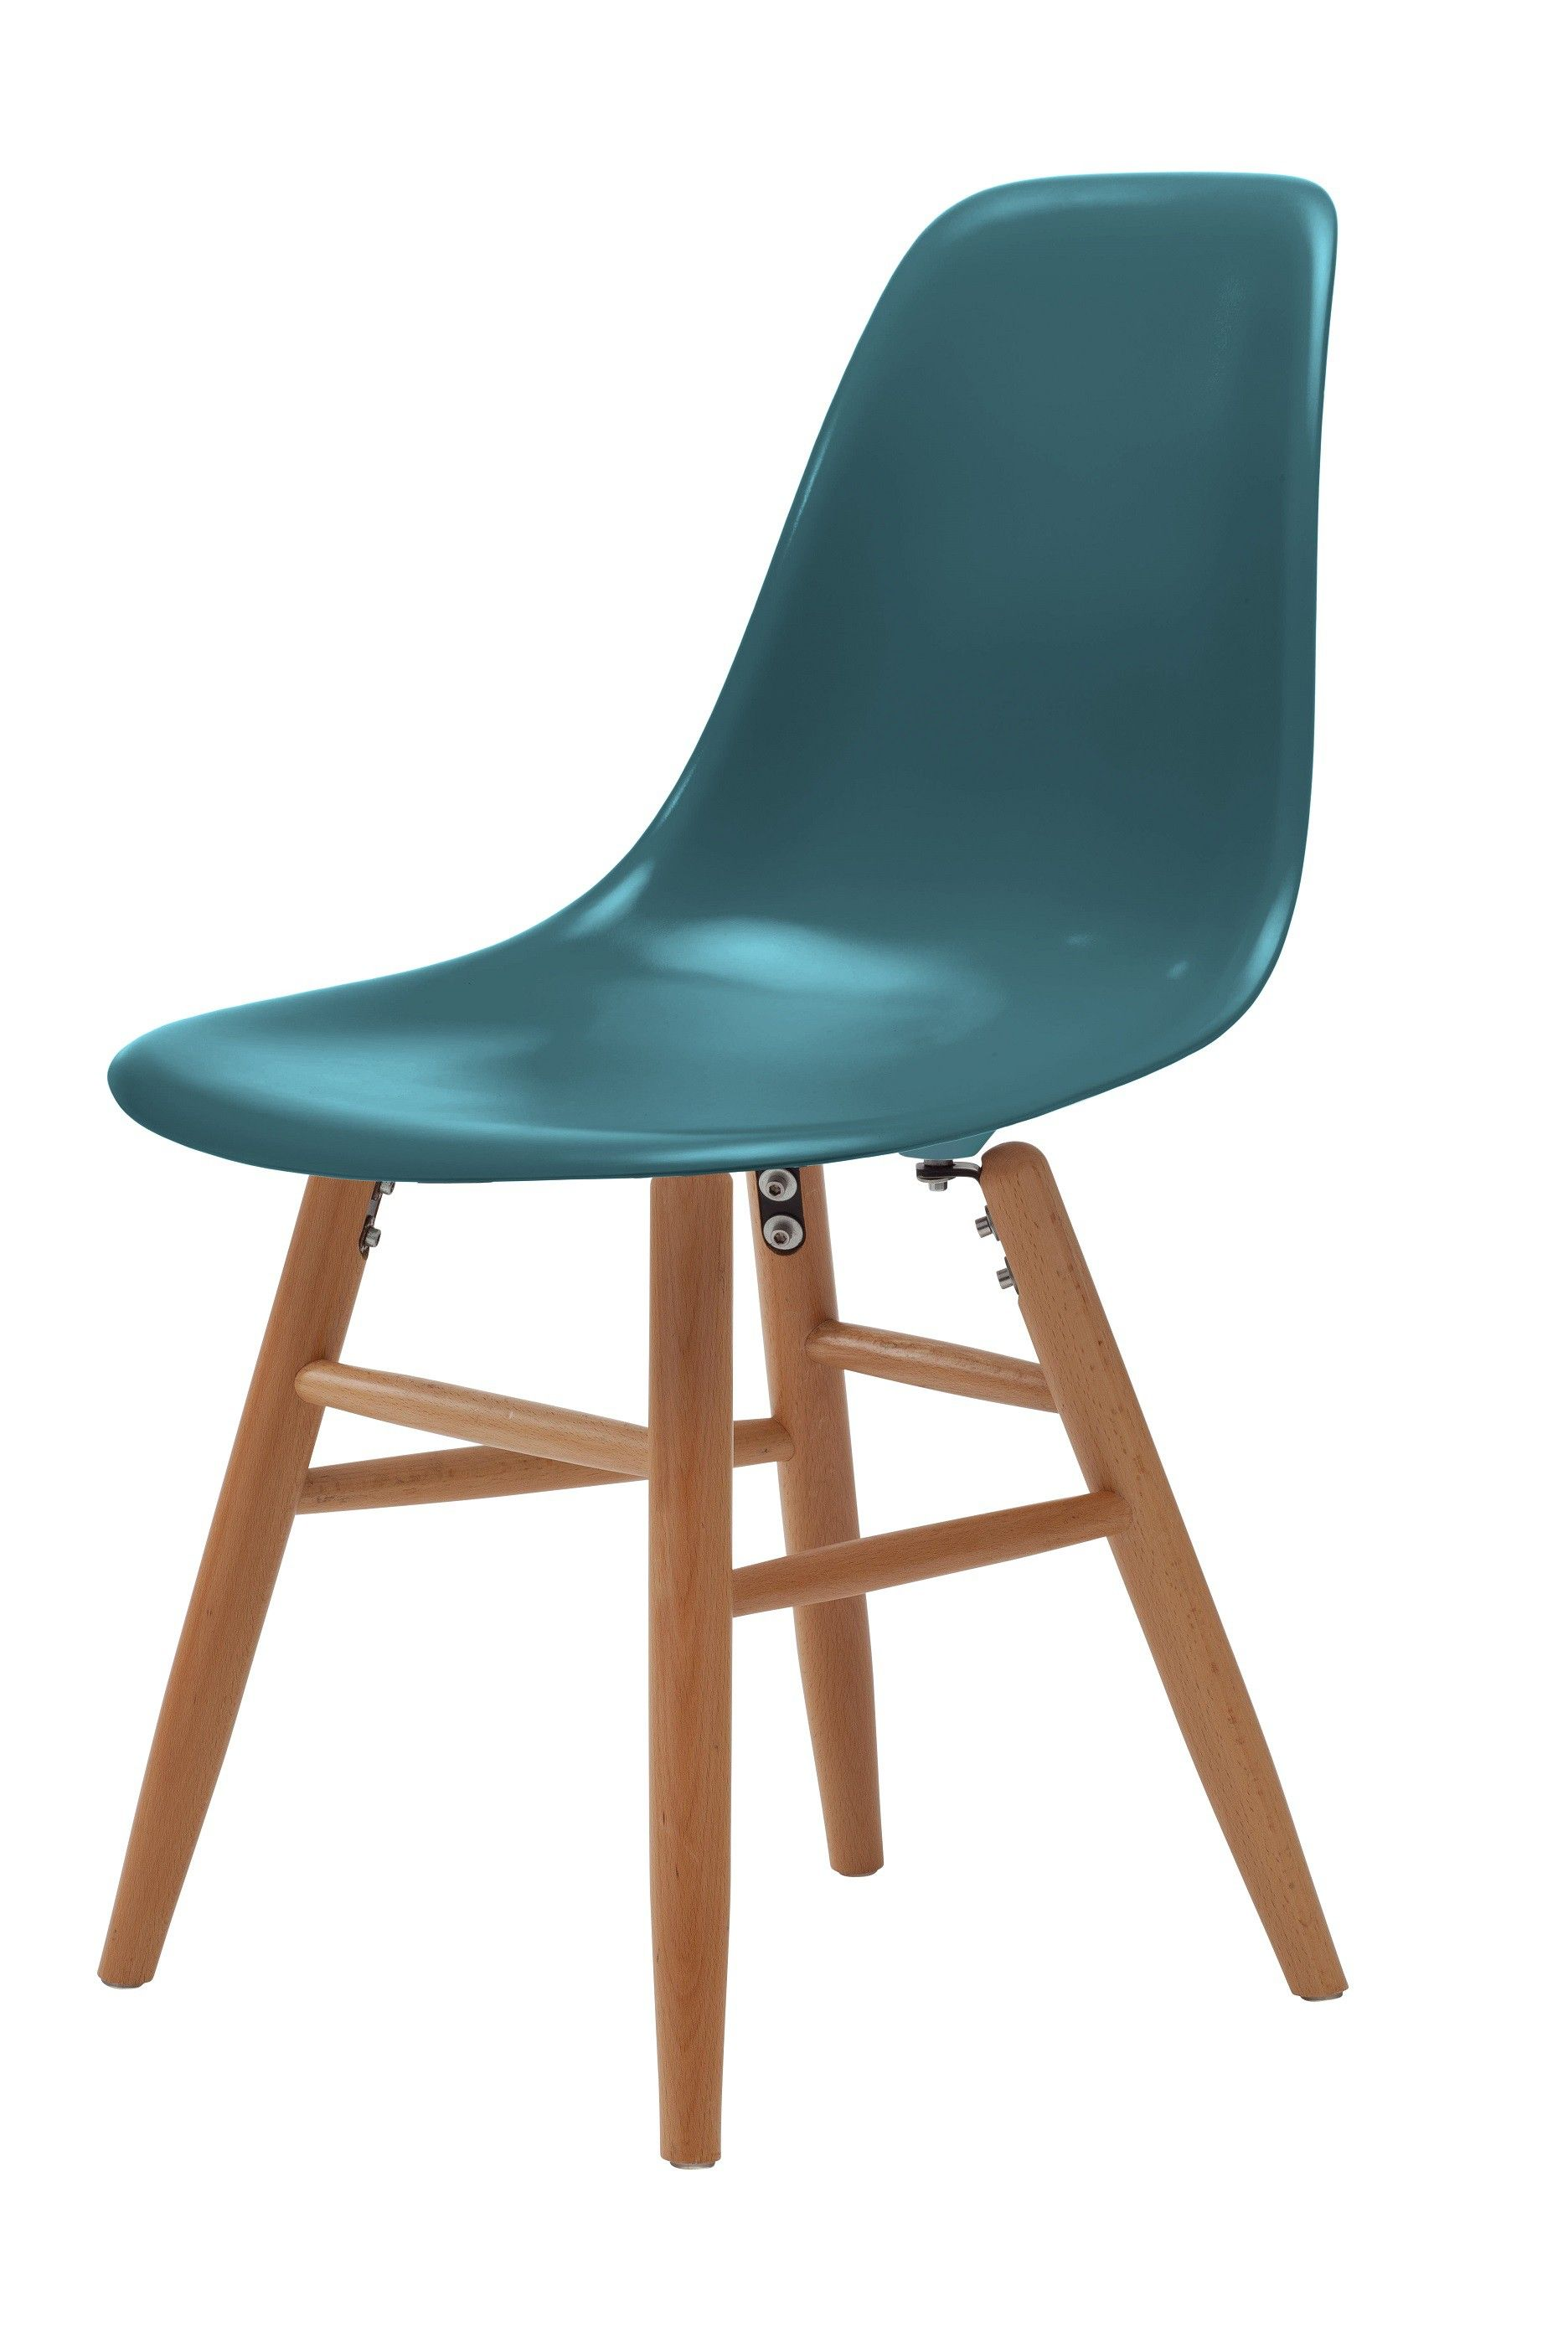 Eames Replica Chair Milan Direct Eames Premium Replica Lounge